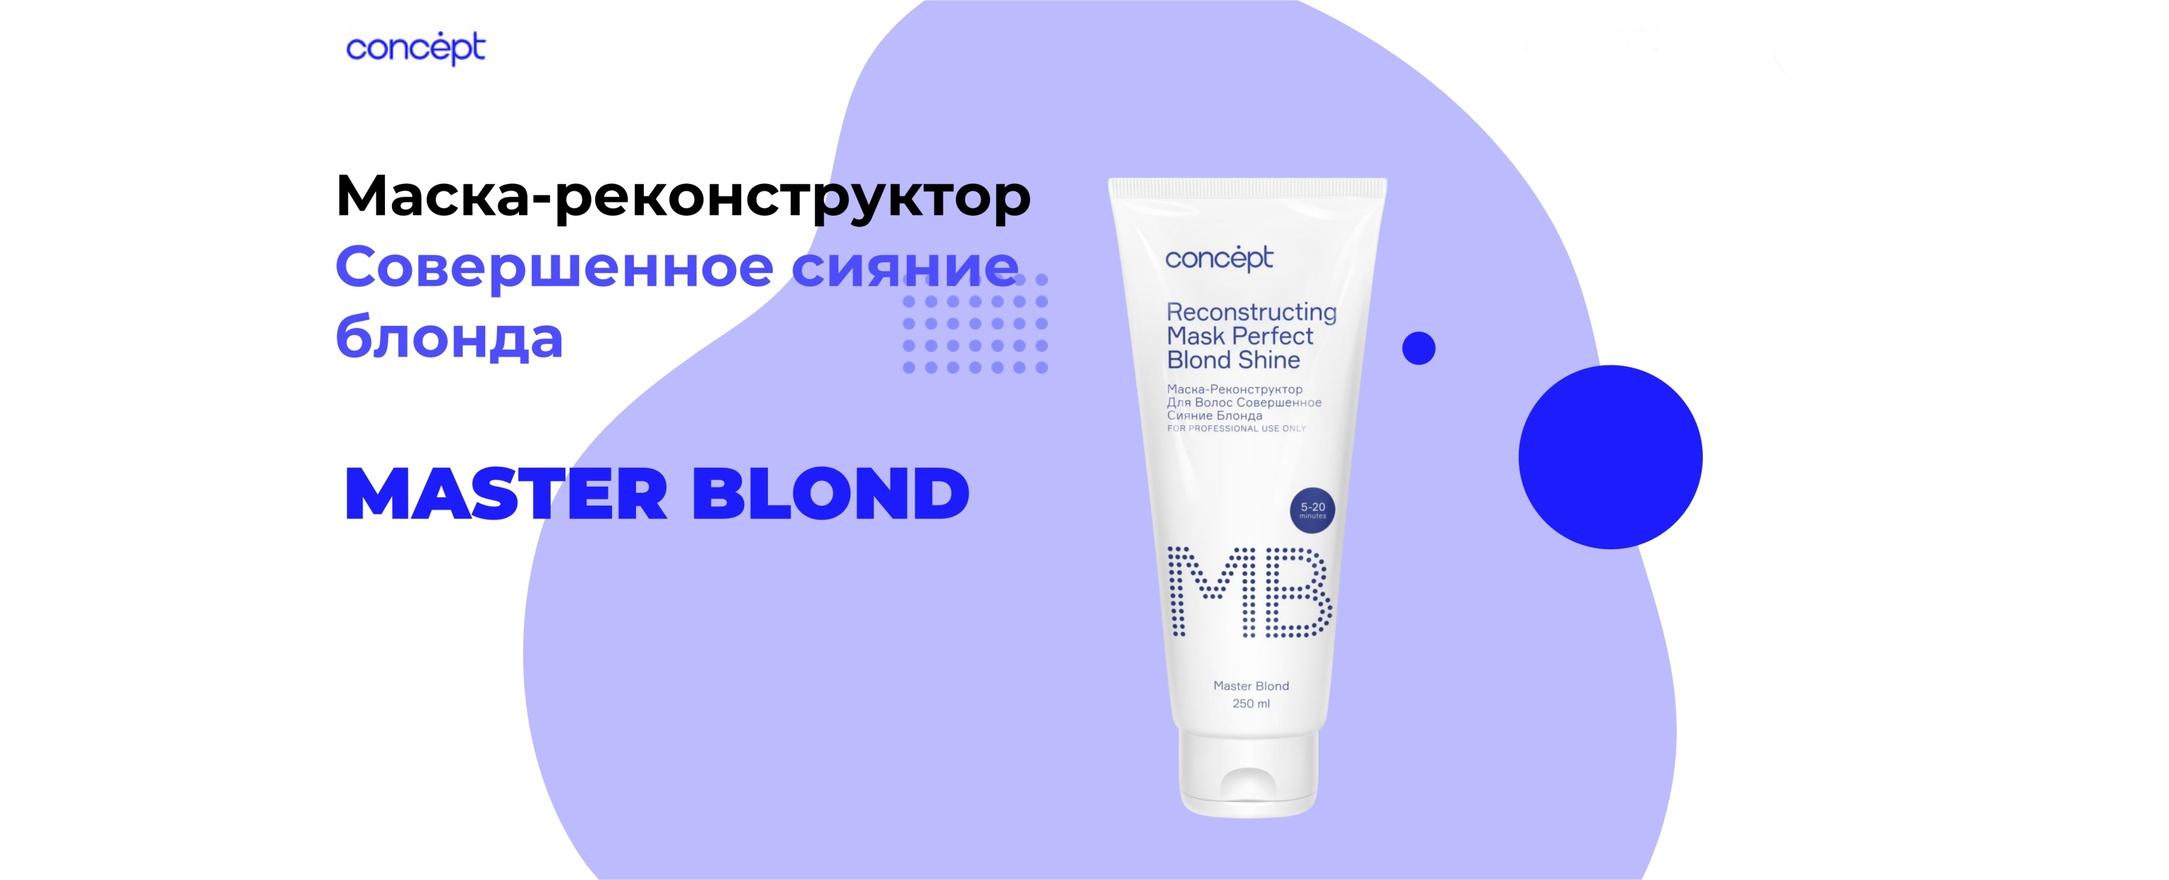 Concept Master Blond